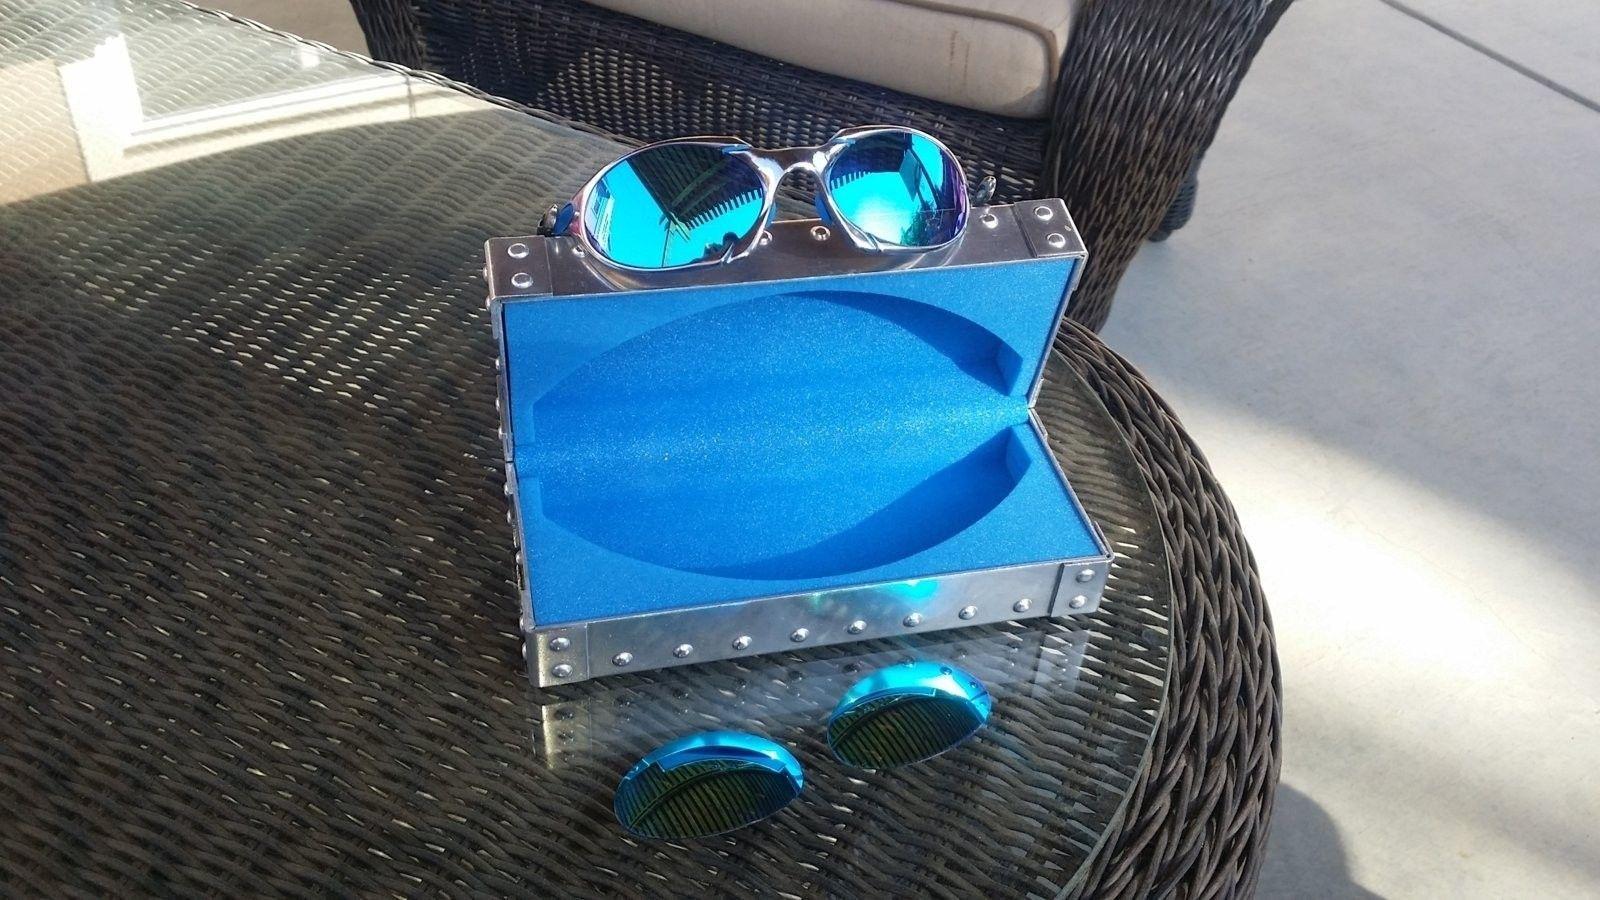 Turbine Sapphire Polarized Cut To R1's Lenses…. - 20160912_170212.jpg